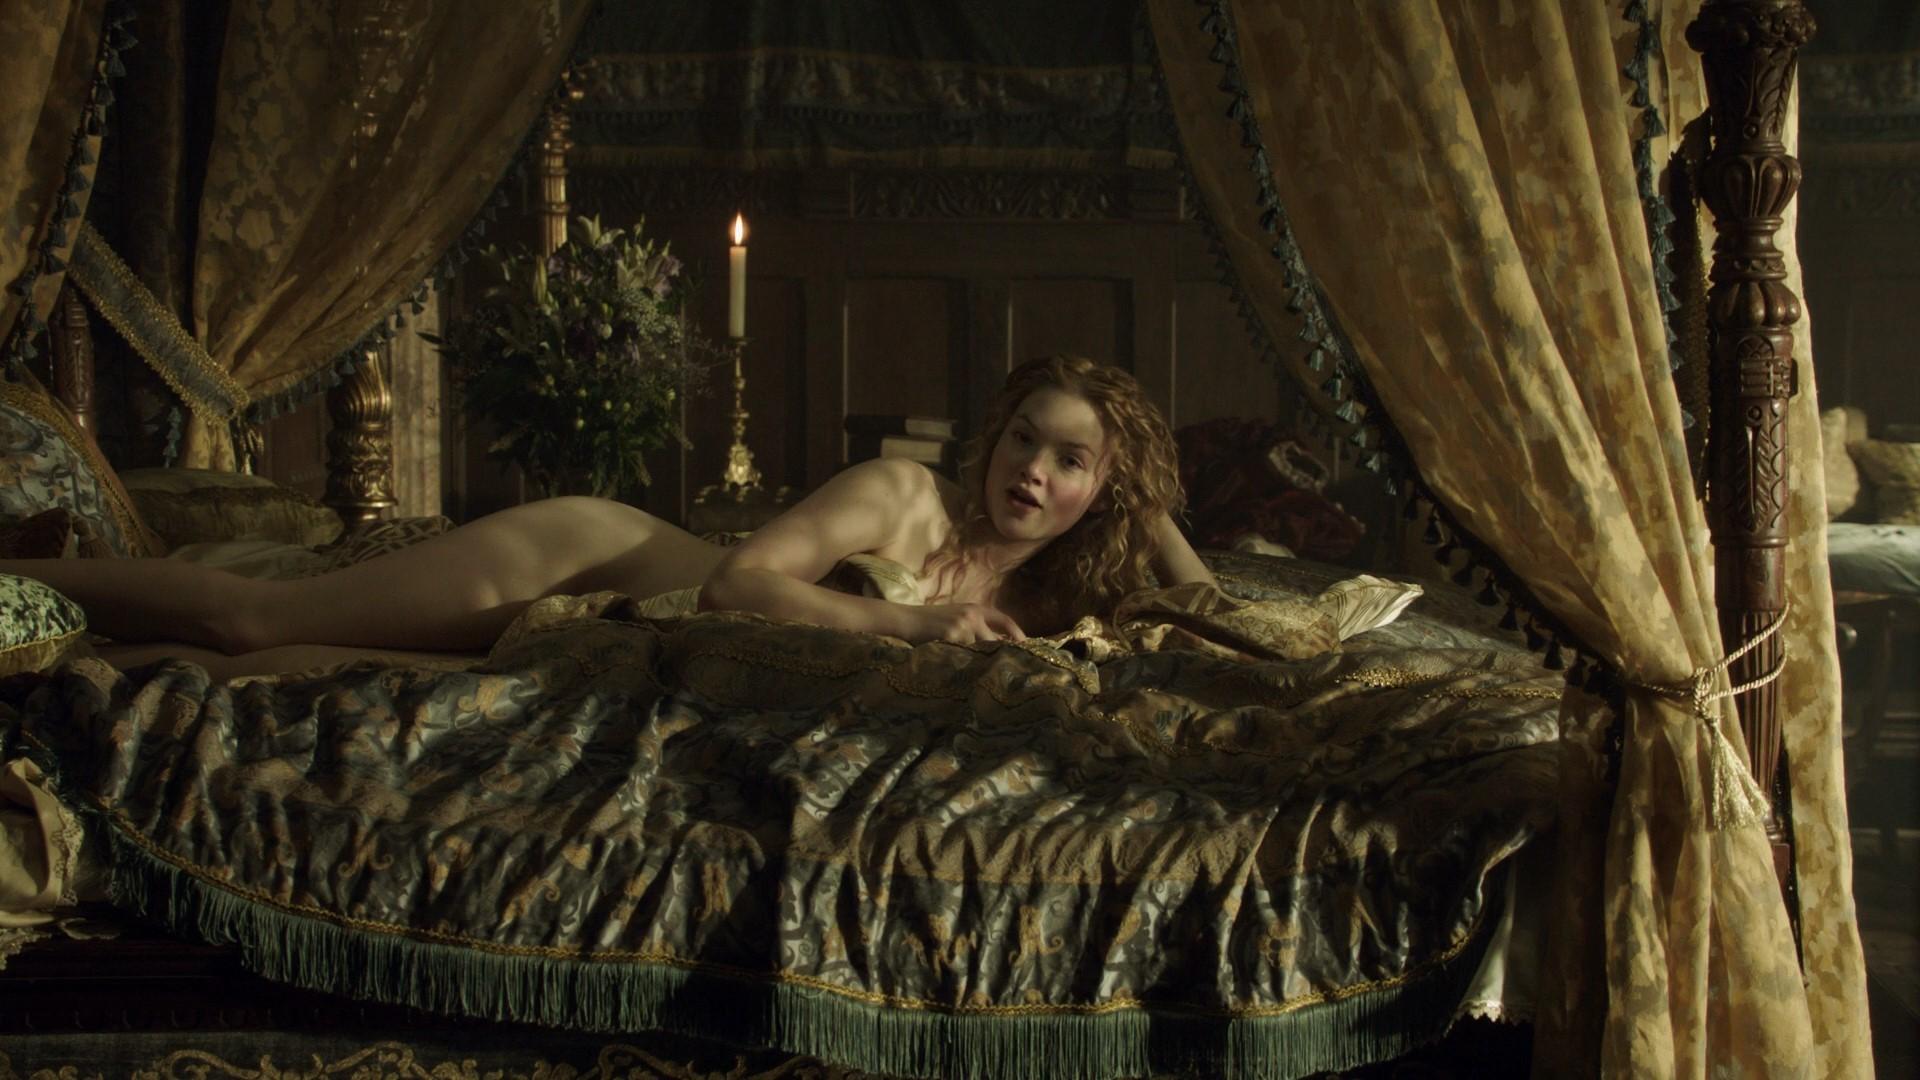 Holliday grainger celebrity nude